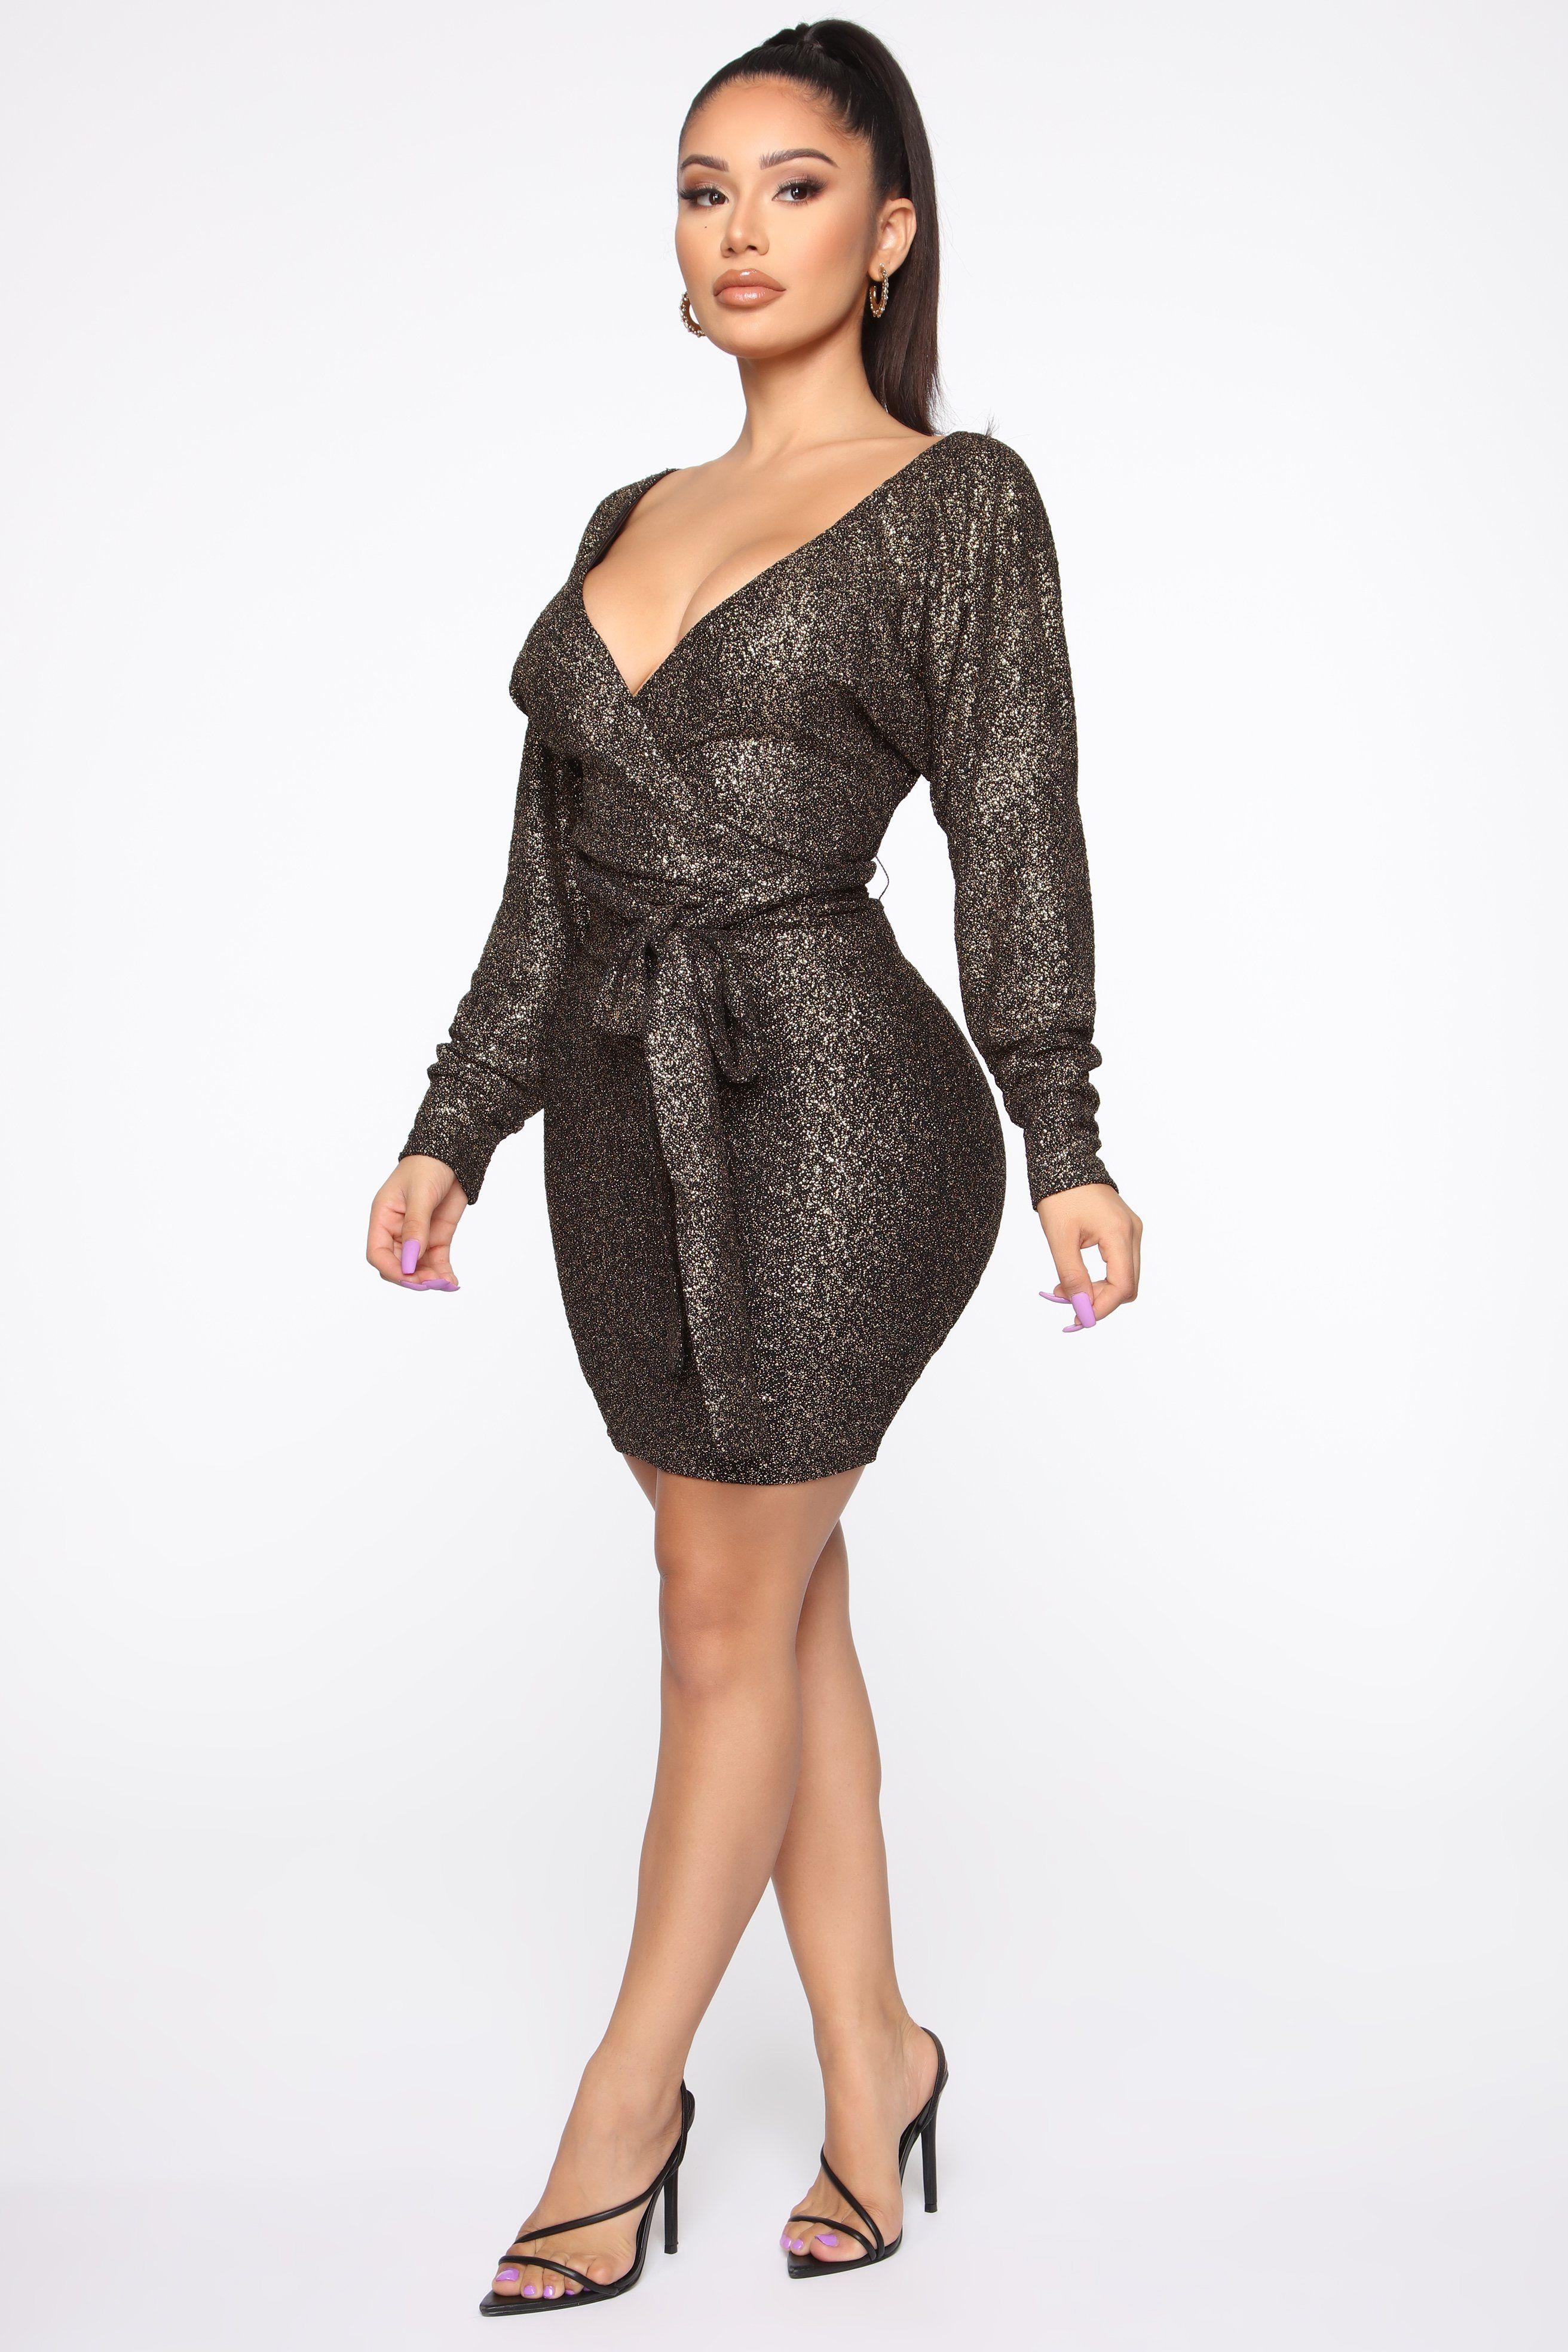 Time For My Date Mini Dress Gold Metallic knit dress